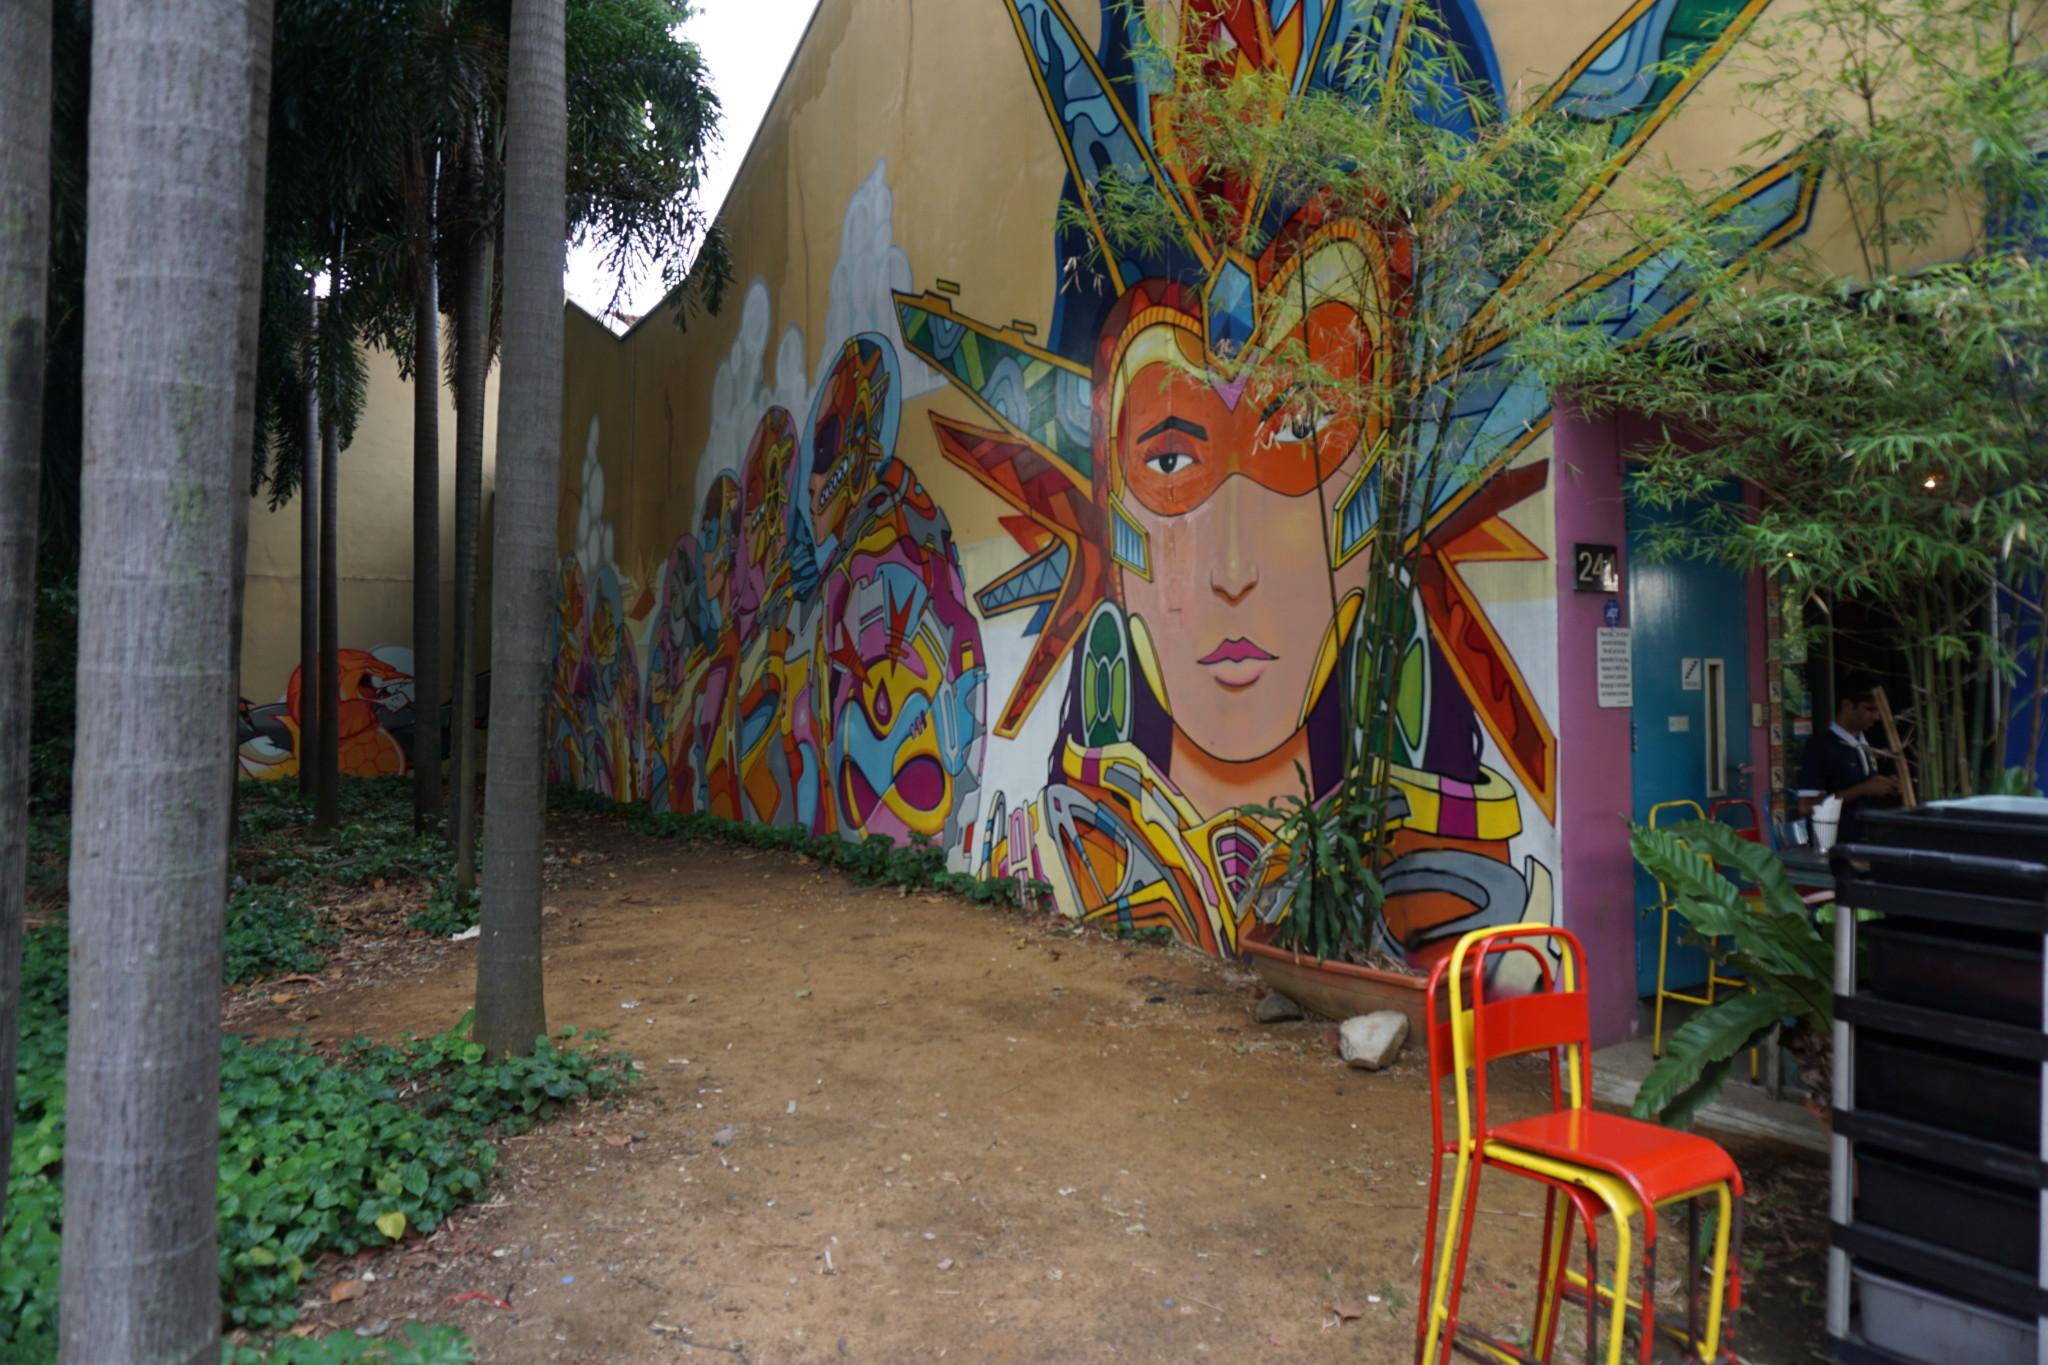 Cool Wall Mural at Haji Lane